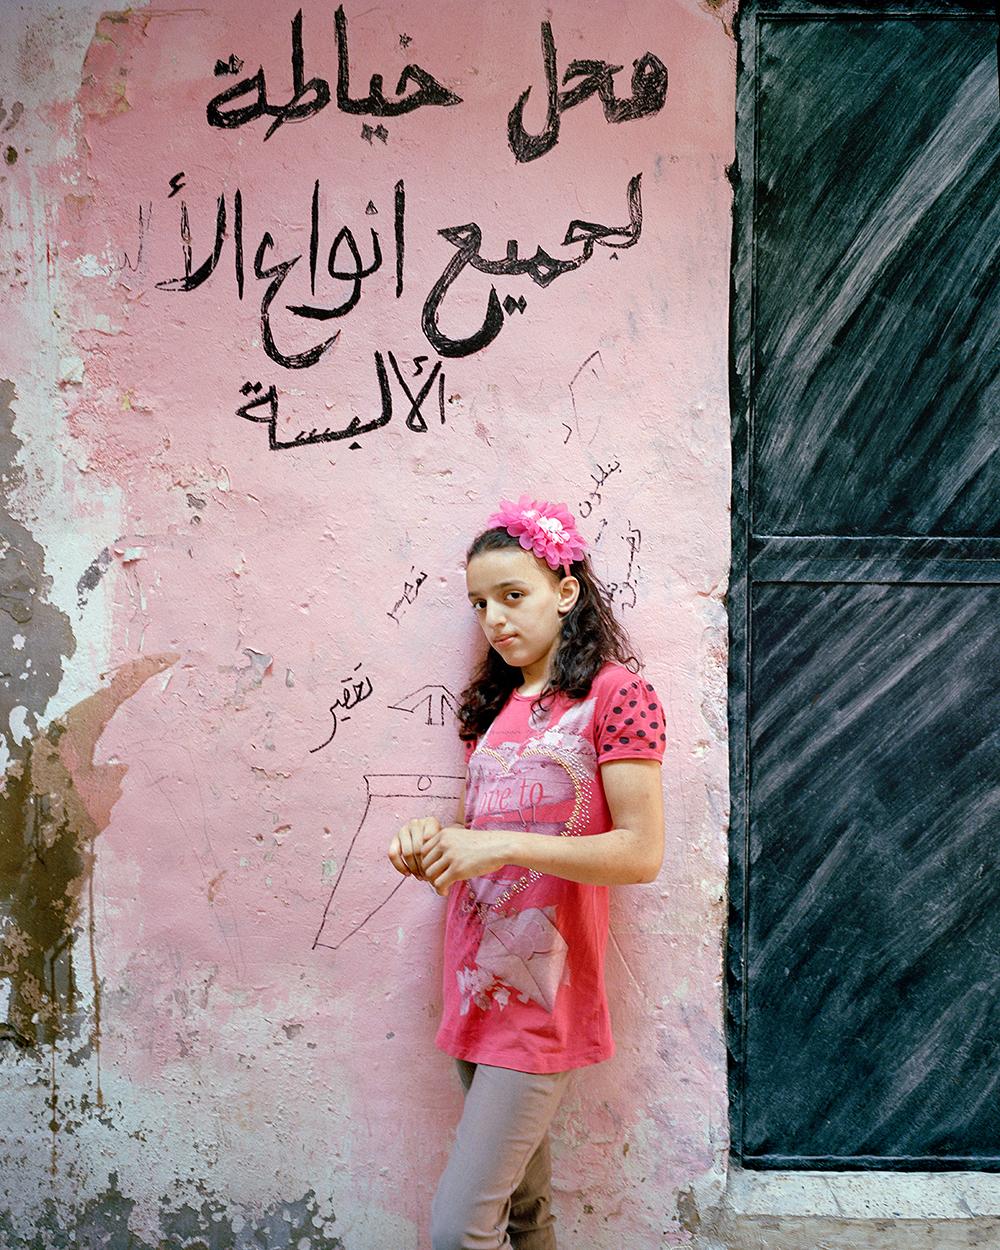 Khawla 12, Bourj El Barajneh Refugee Camp, Beirut, 2016